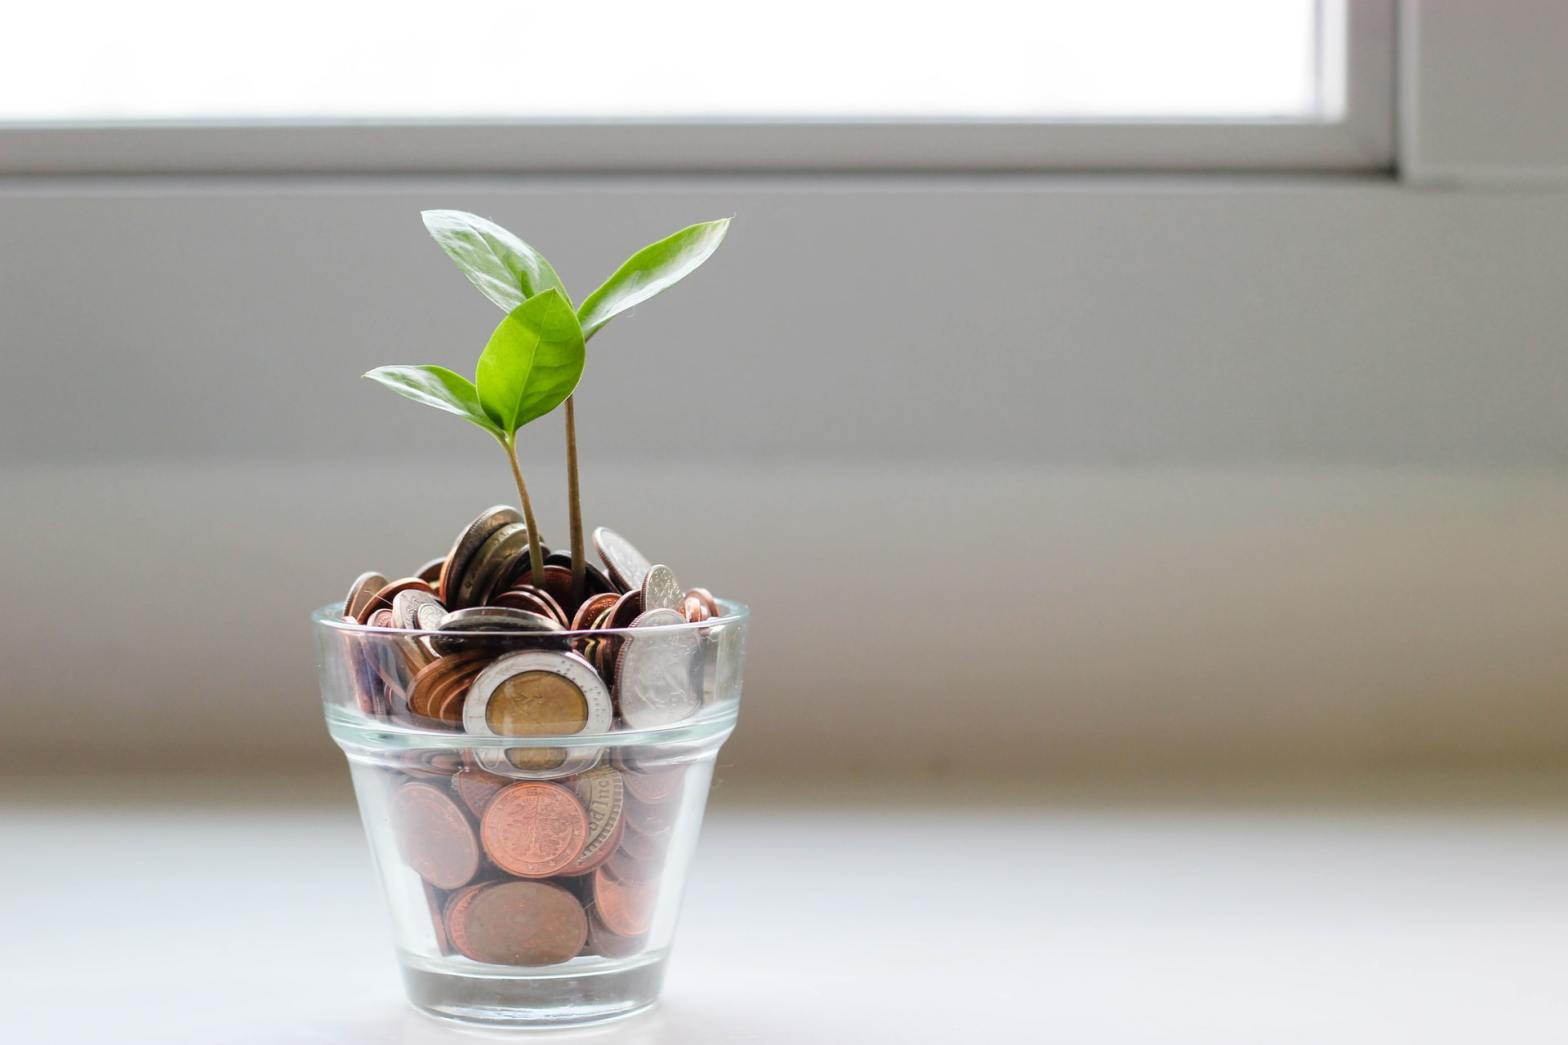 Main image for the blog post 5 ways minimalism improve your finances